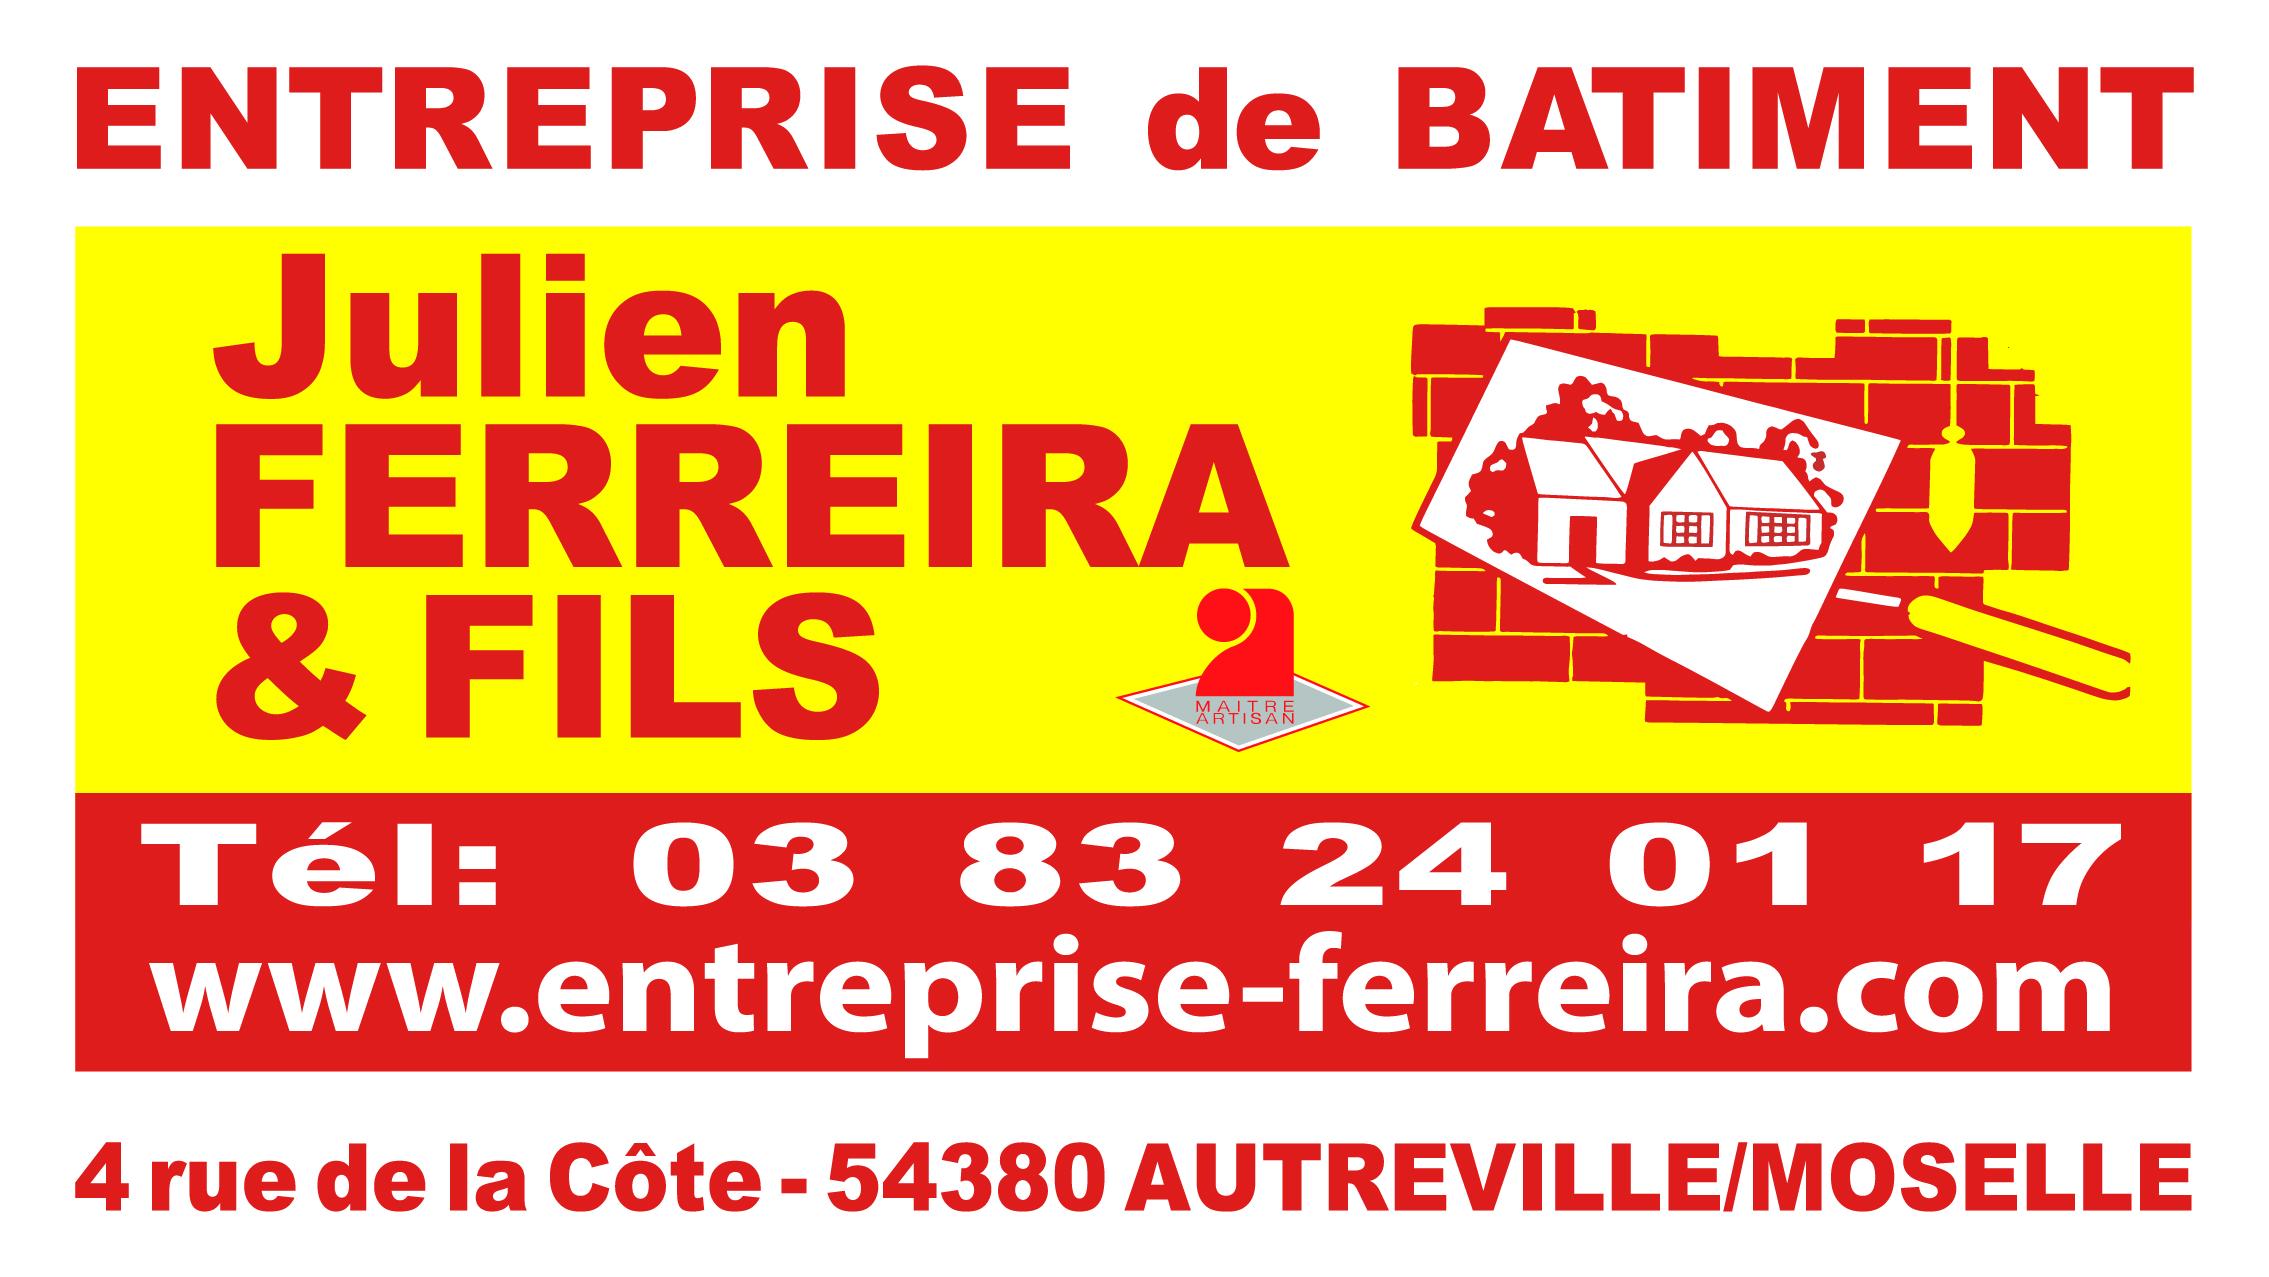 Entreprise de bâtiment Julien FERREIRA & Fils, sponsors du SMEPS